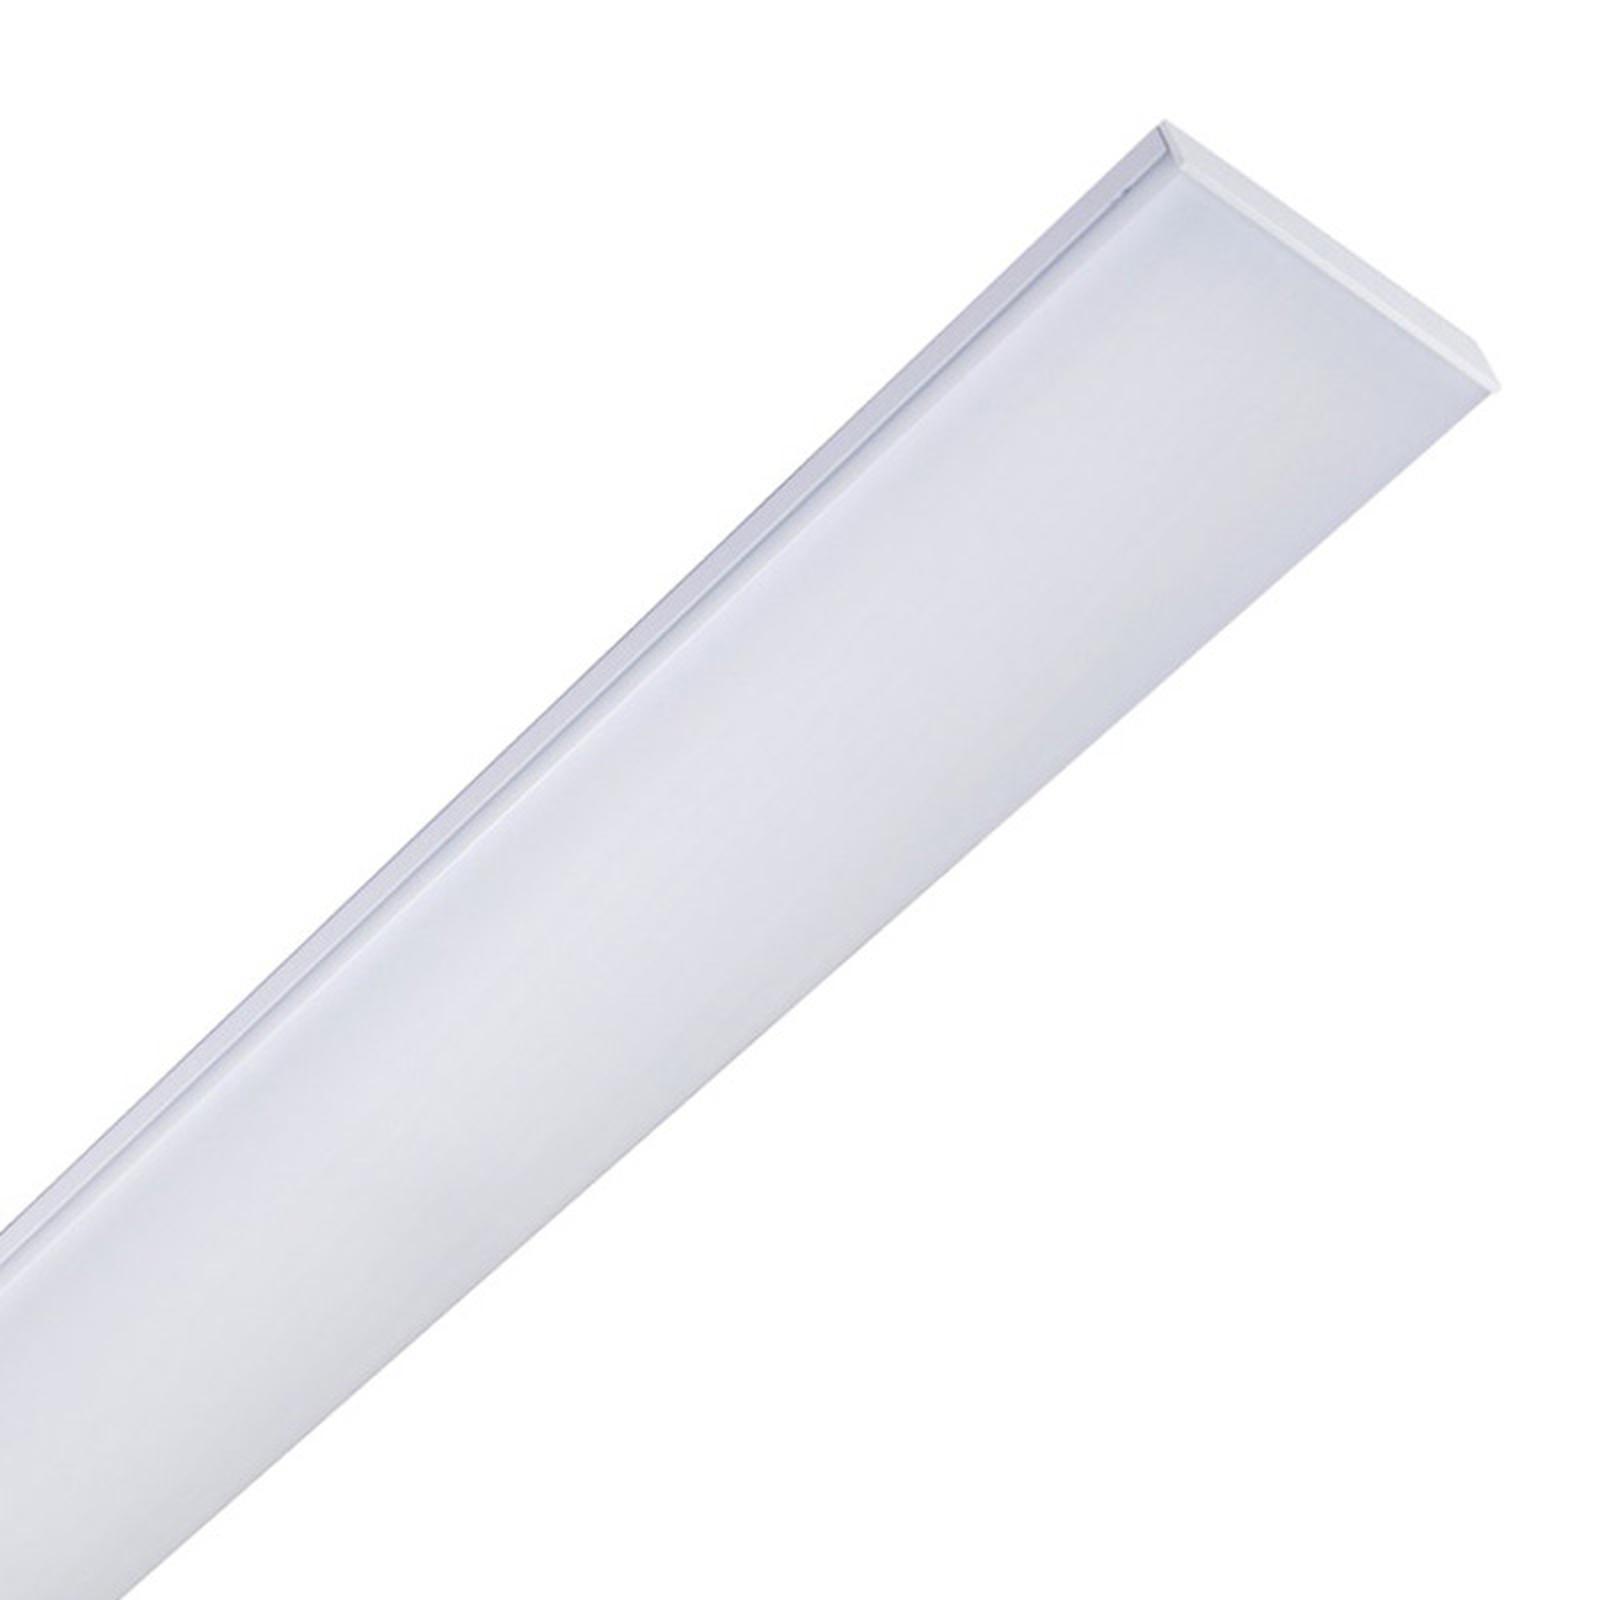 LED-Deckenlampe Planus 60 mit universalweißen LEDs